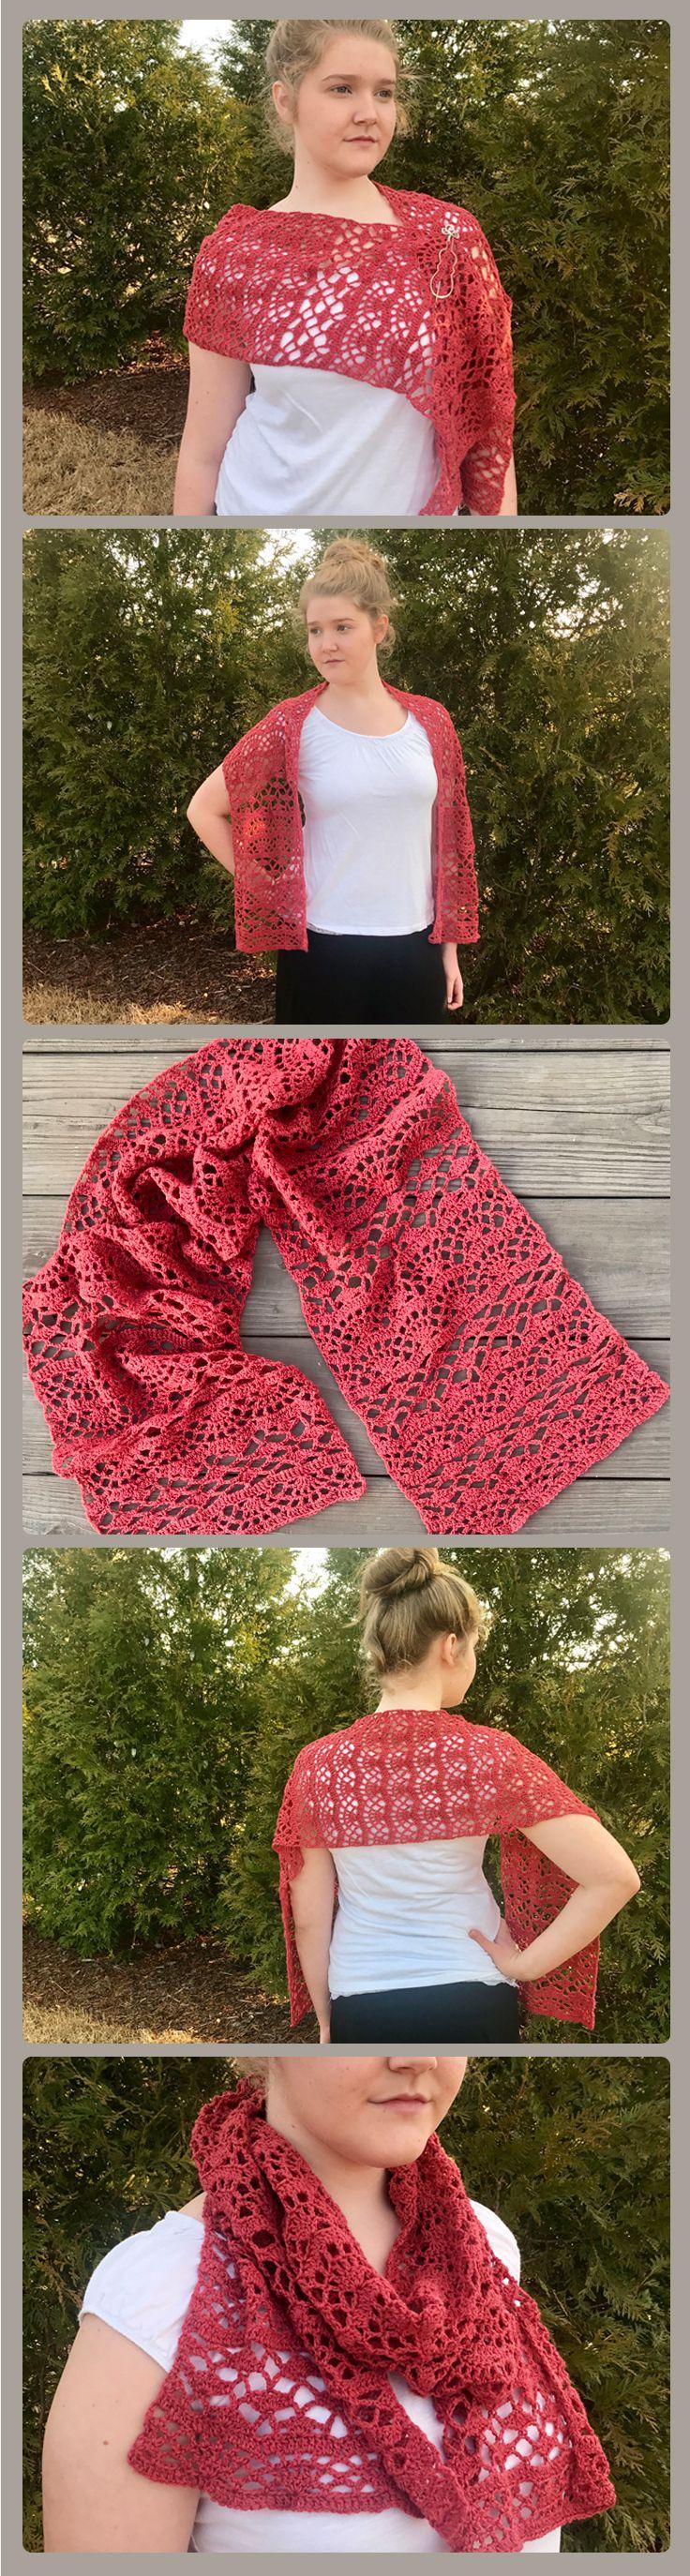 One Love Shawl crochet pattern - a one skein project crochet shawl pattern - a lacy shawl made with fingering weight yarn.